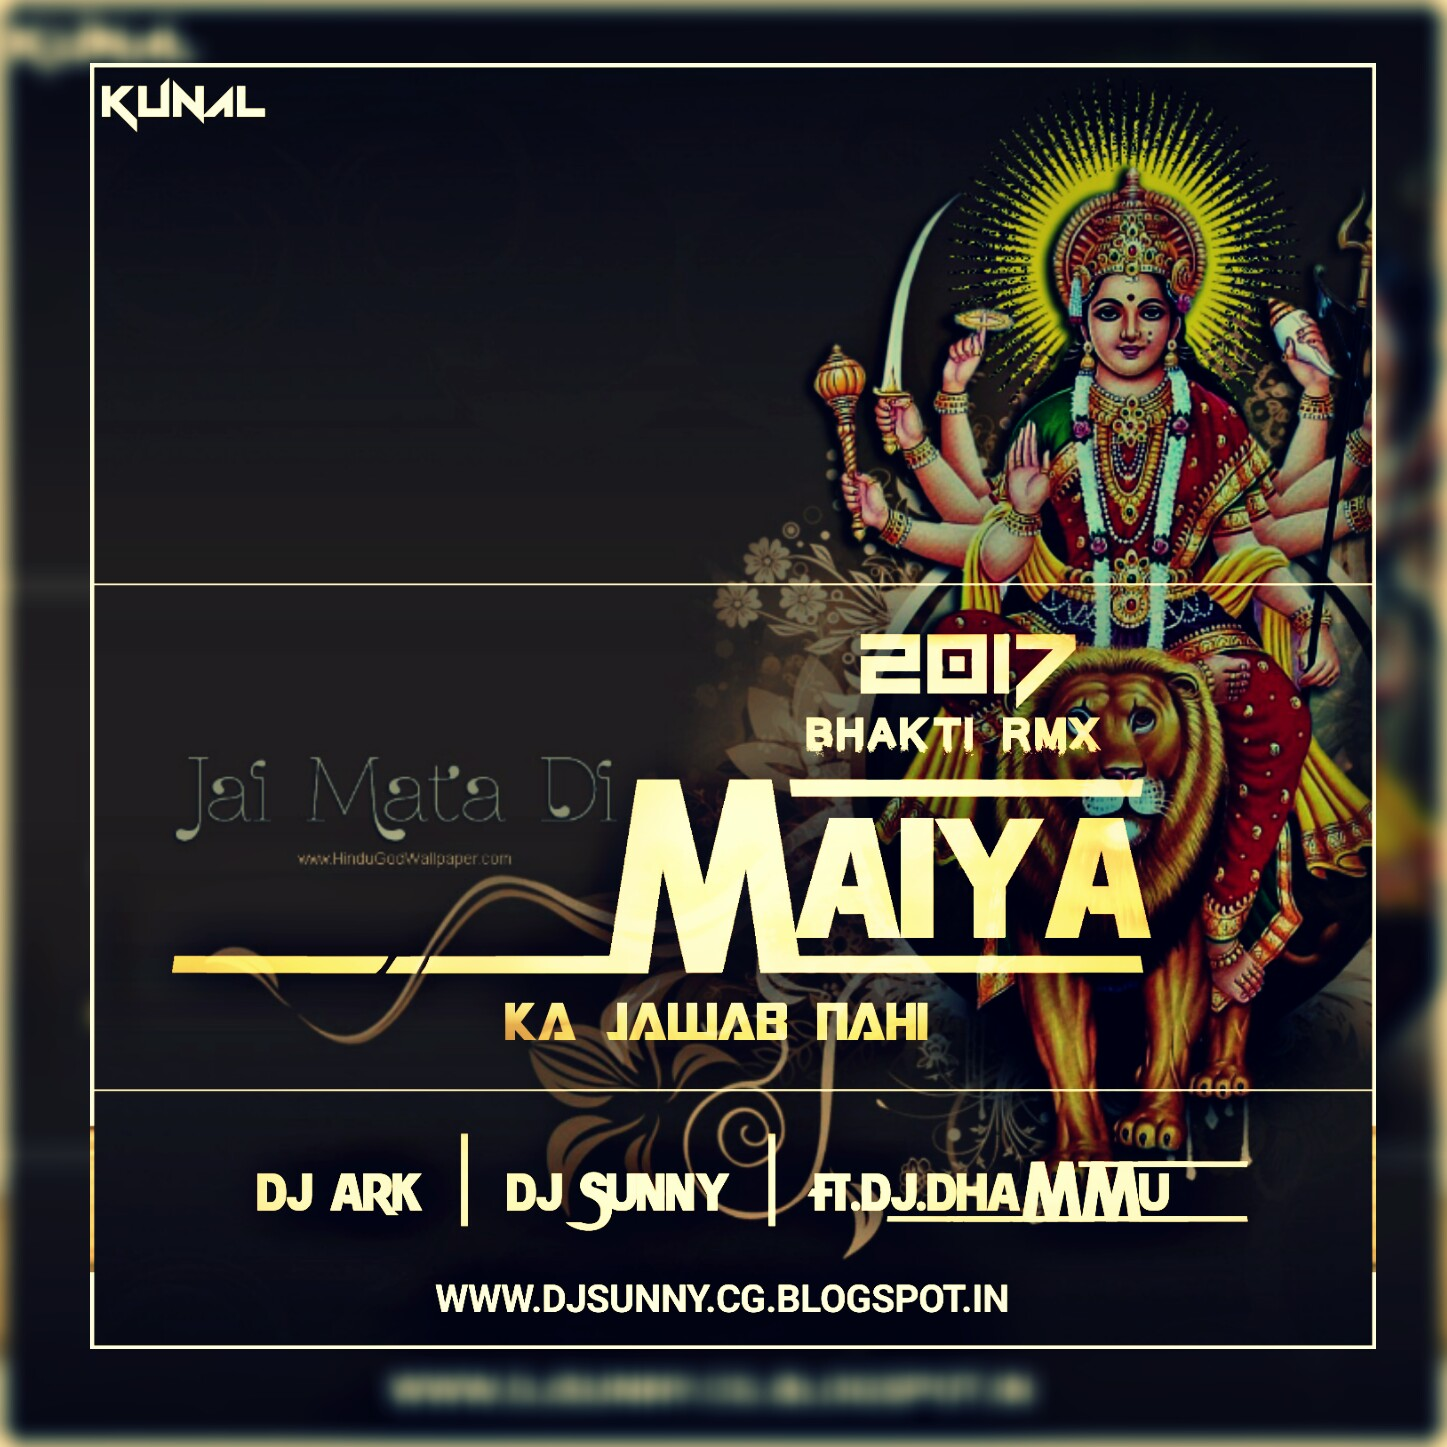 DJ SUNNY KJM: 2017